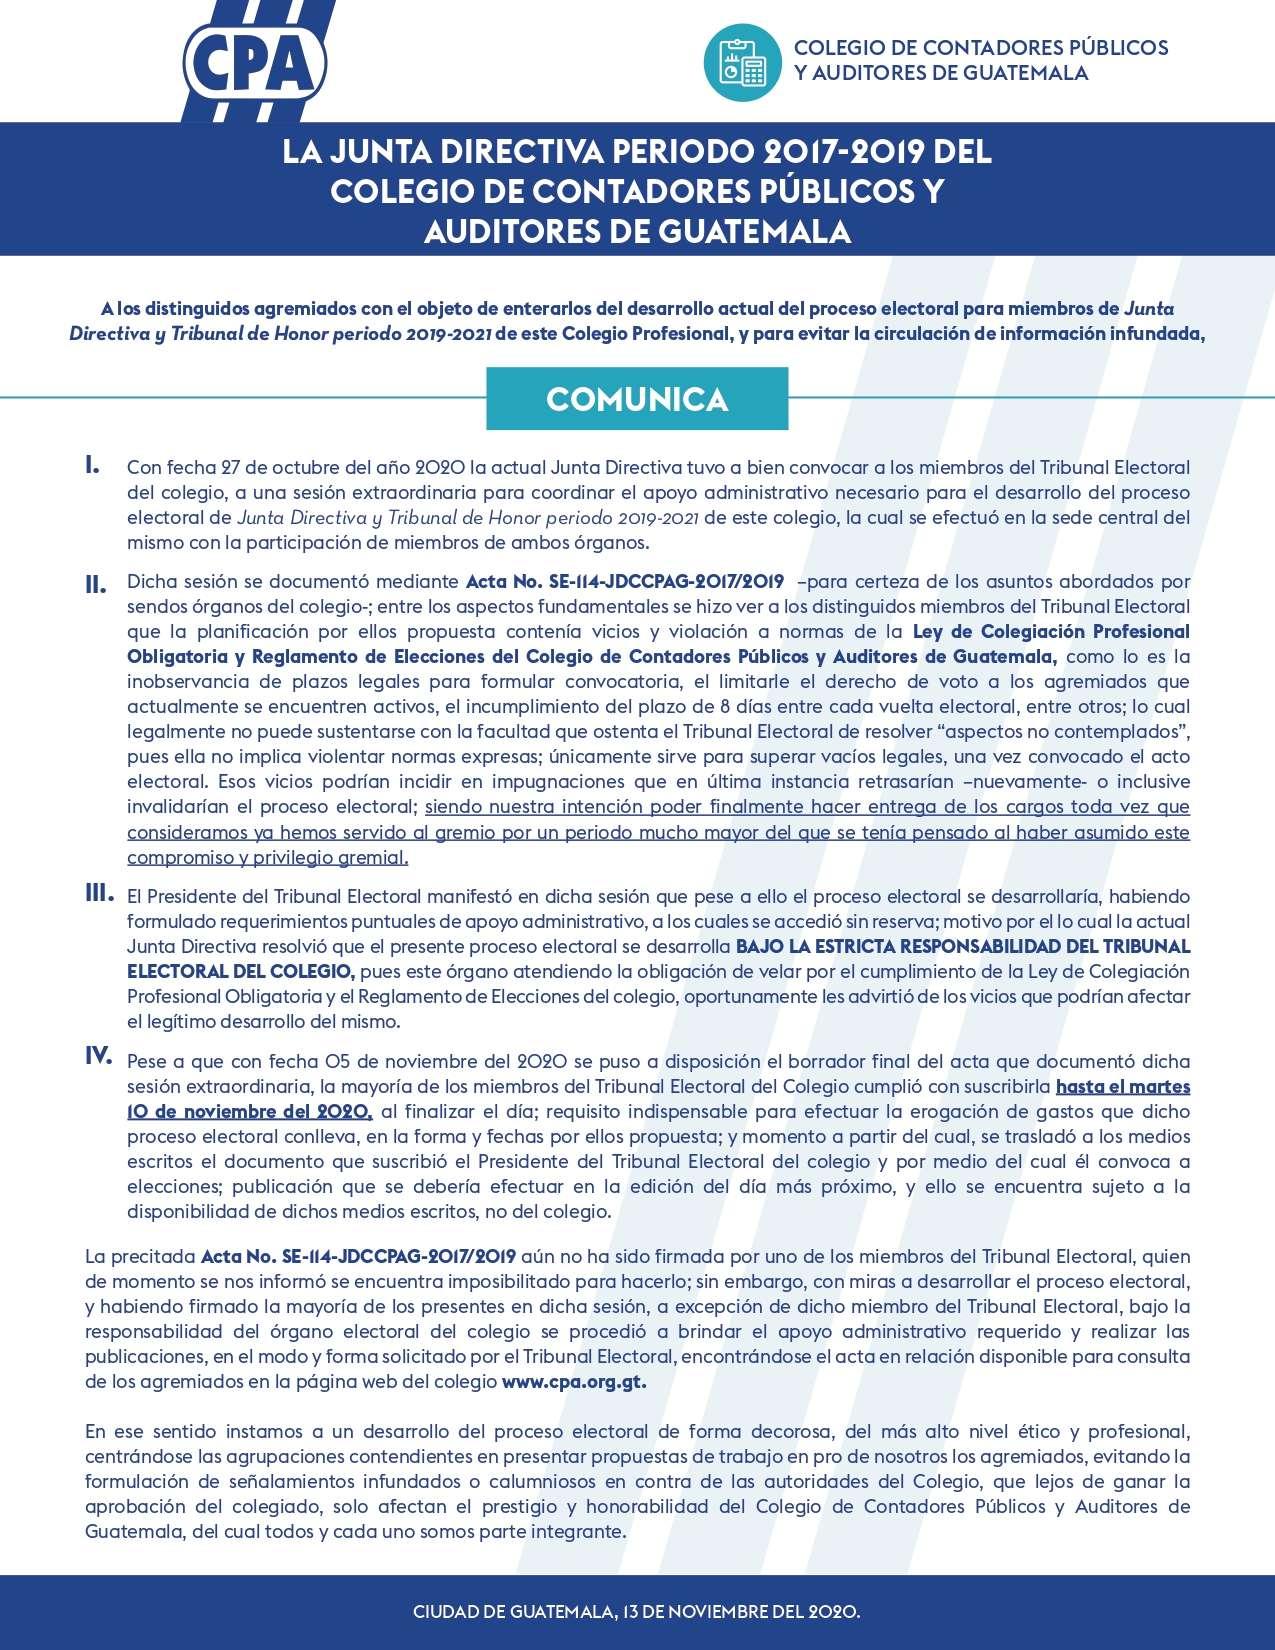 COMUNICADO 13 DE NOVIEMBRE DEL 2020